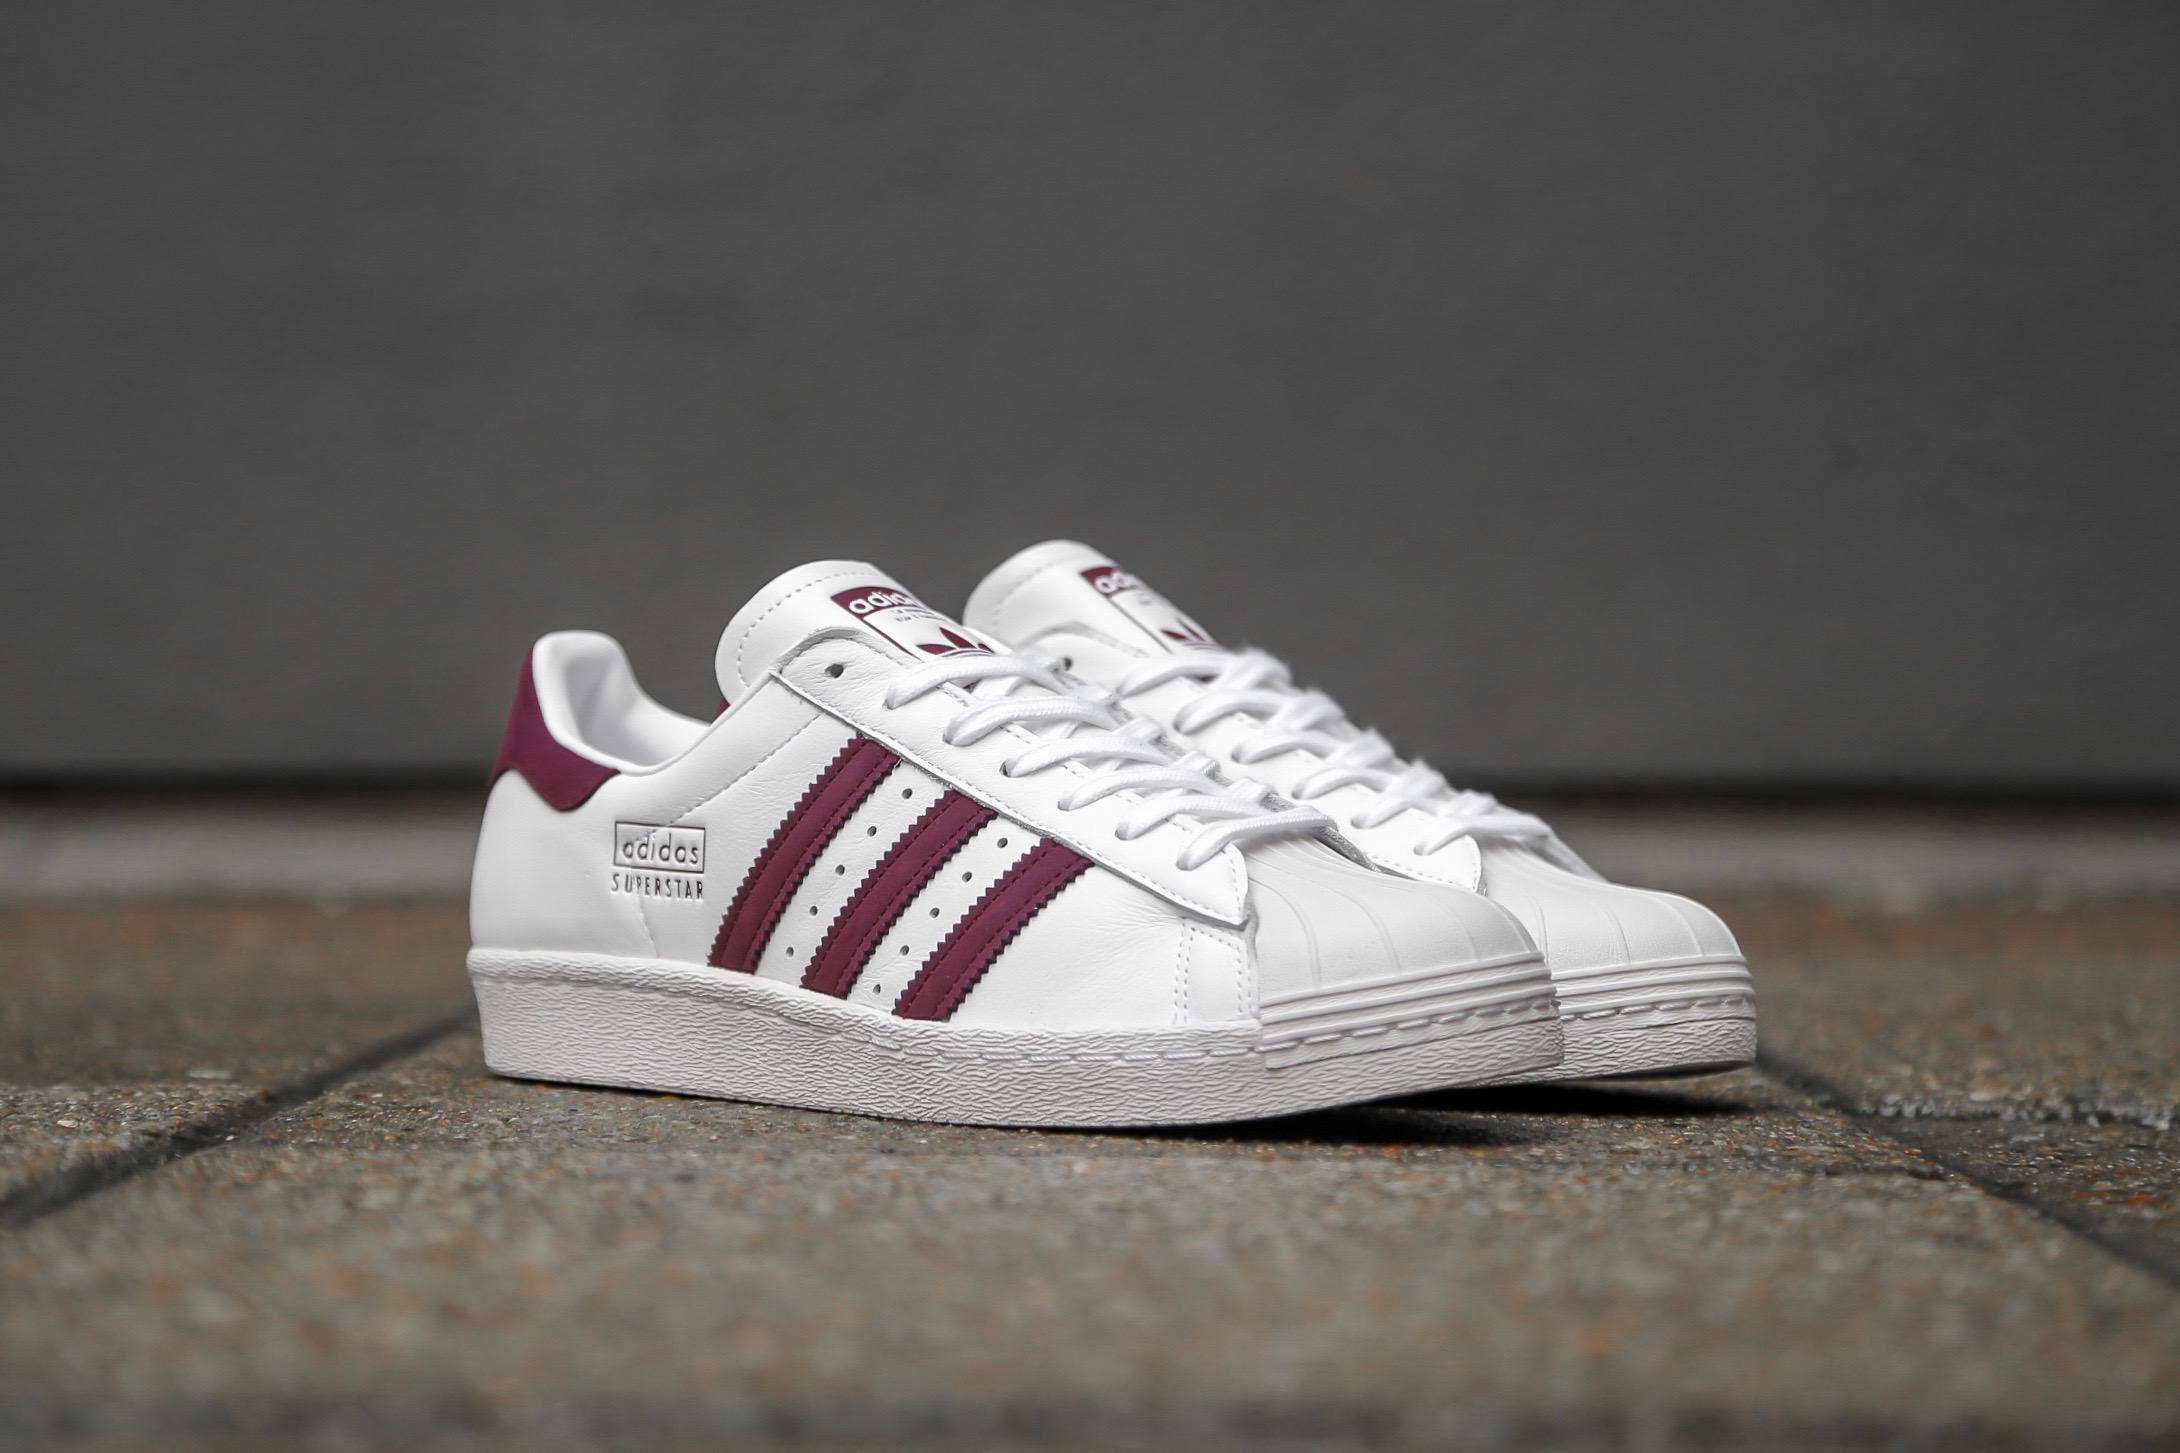 Adidas Superstar 80s W Ftwr WhiteCore BlackCrystal White